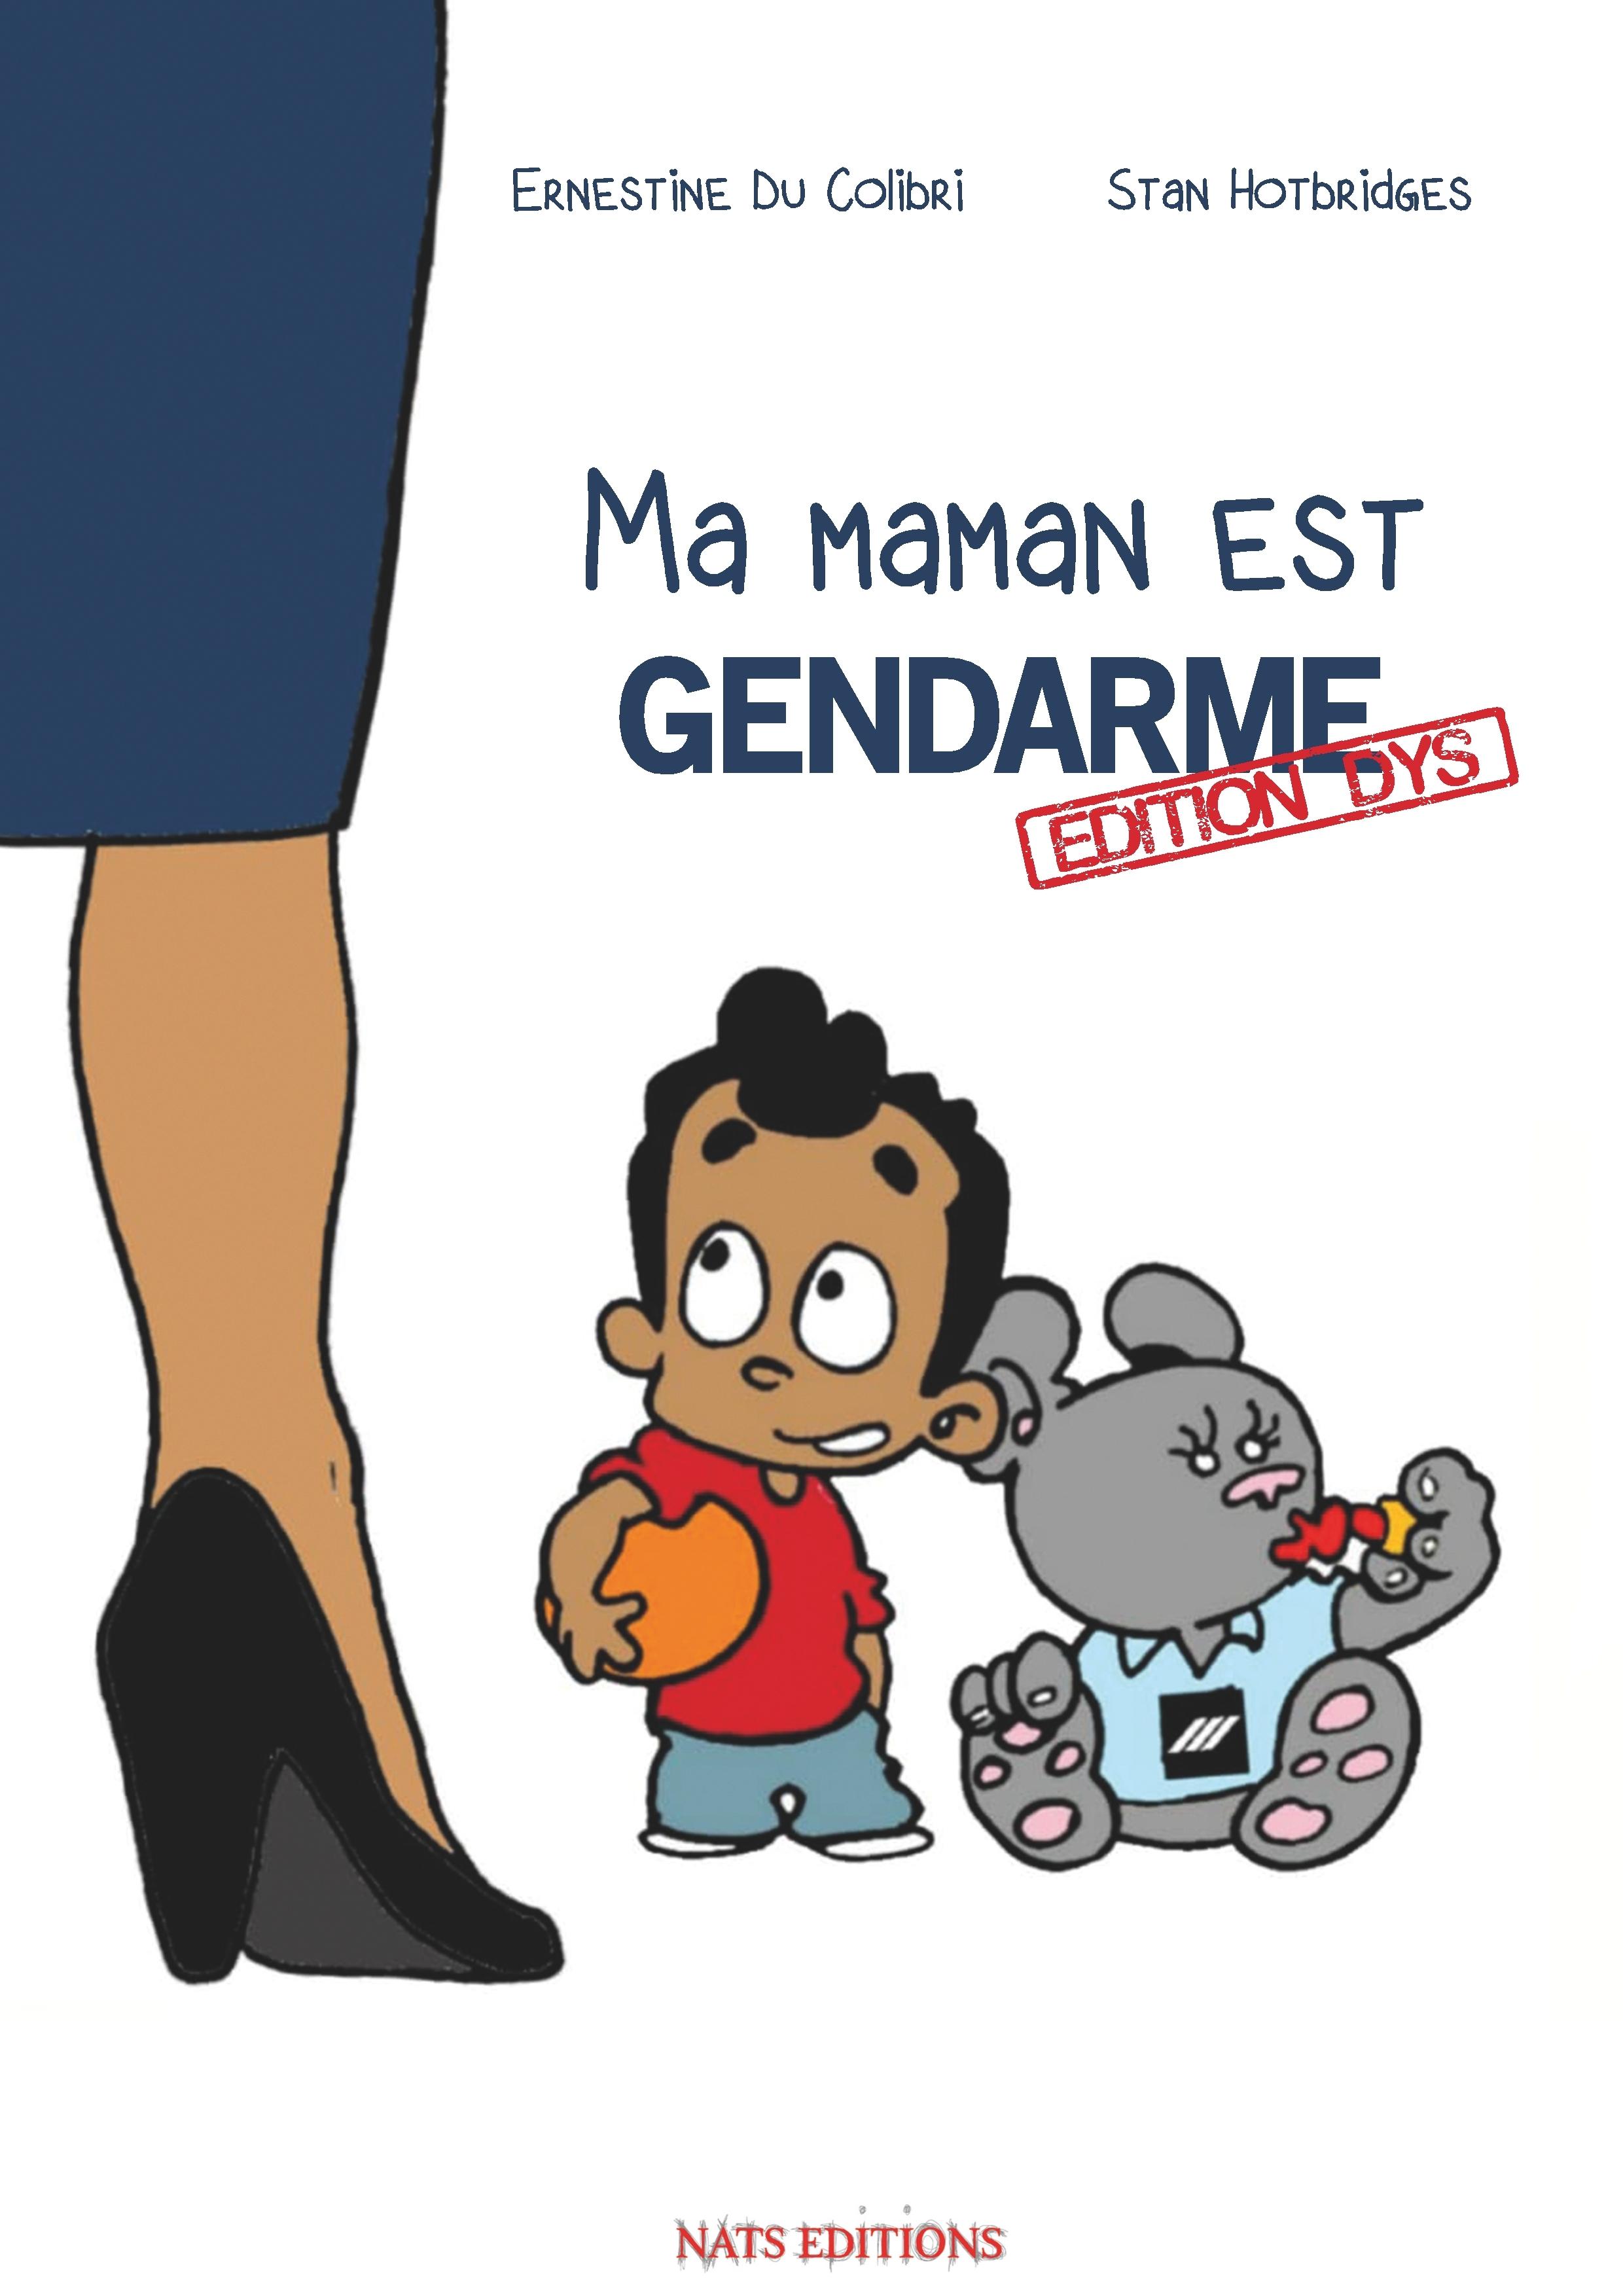 MA MAMAN EST GENDARME - EDITION DYS